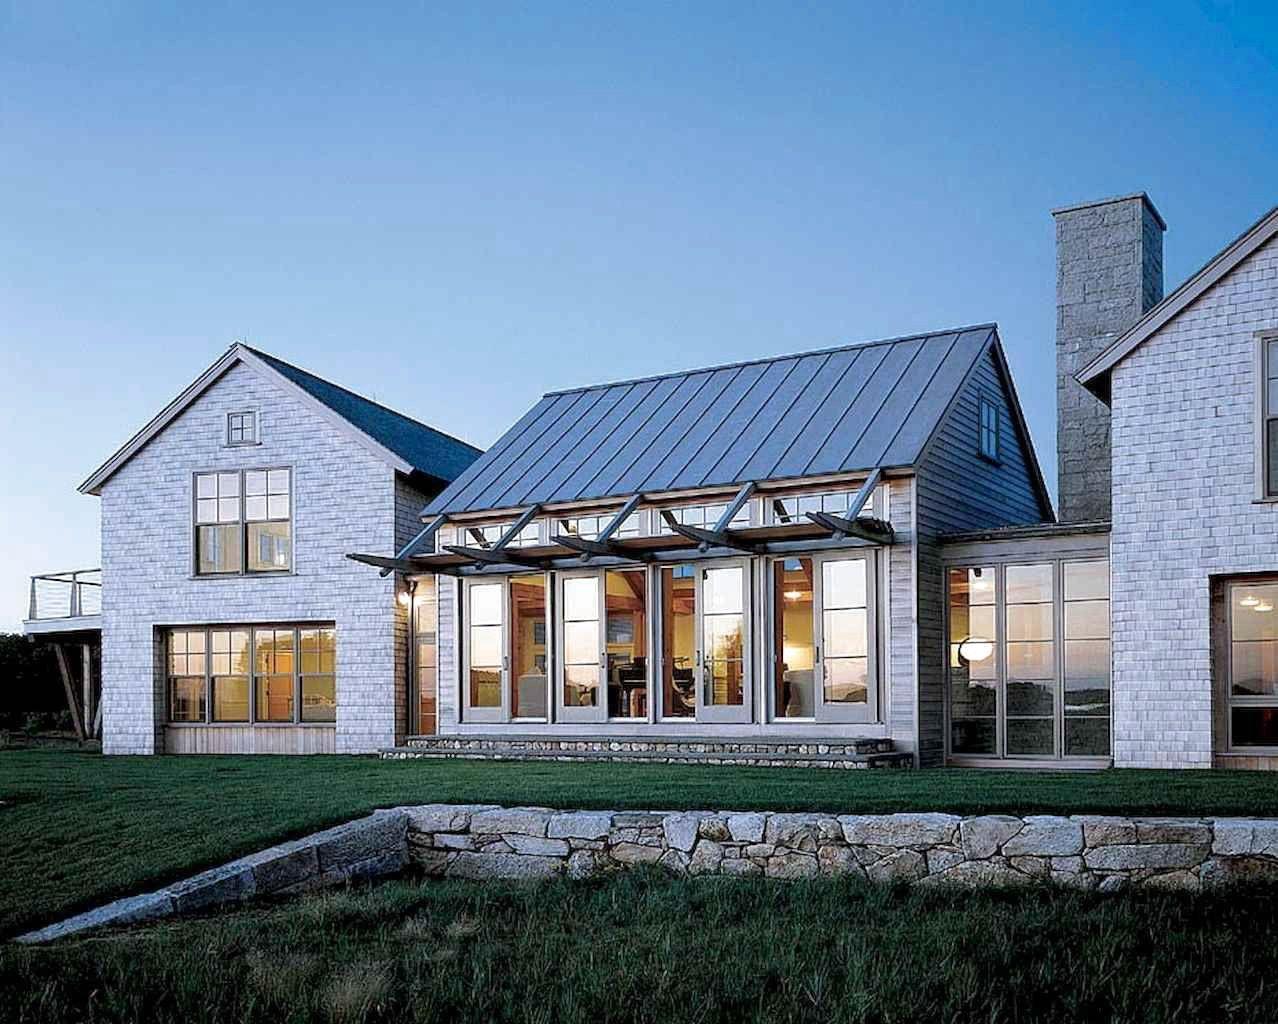 71 Favourite Modern Farmhouse Exterior Design Ideas In 2020